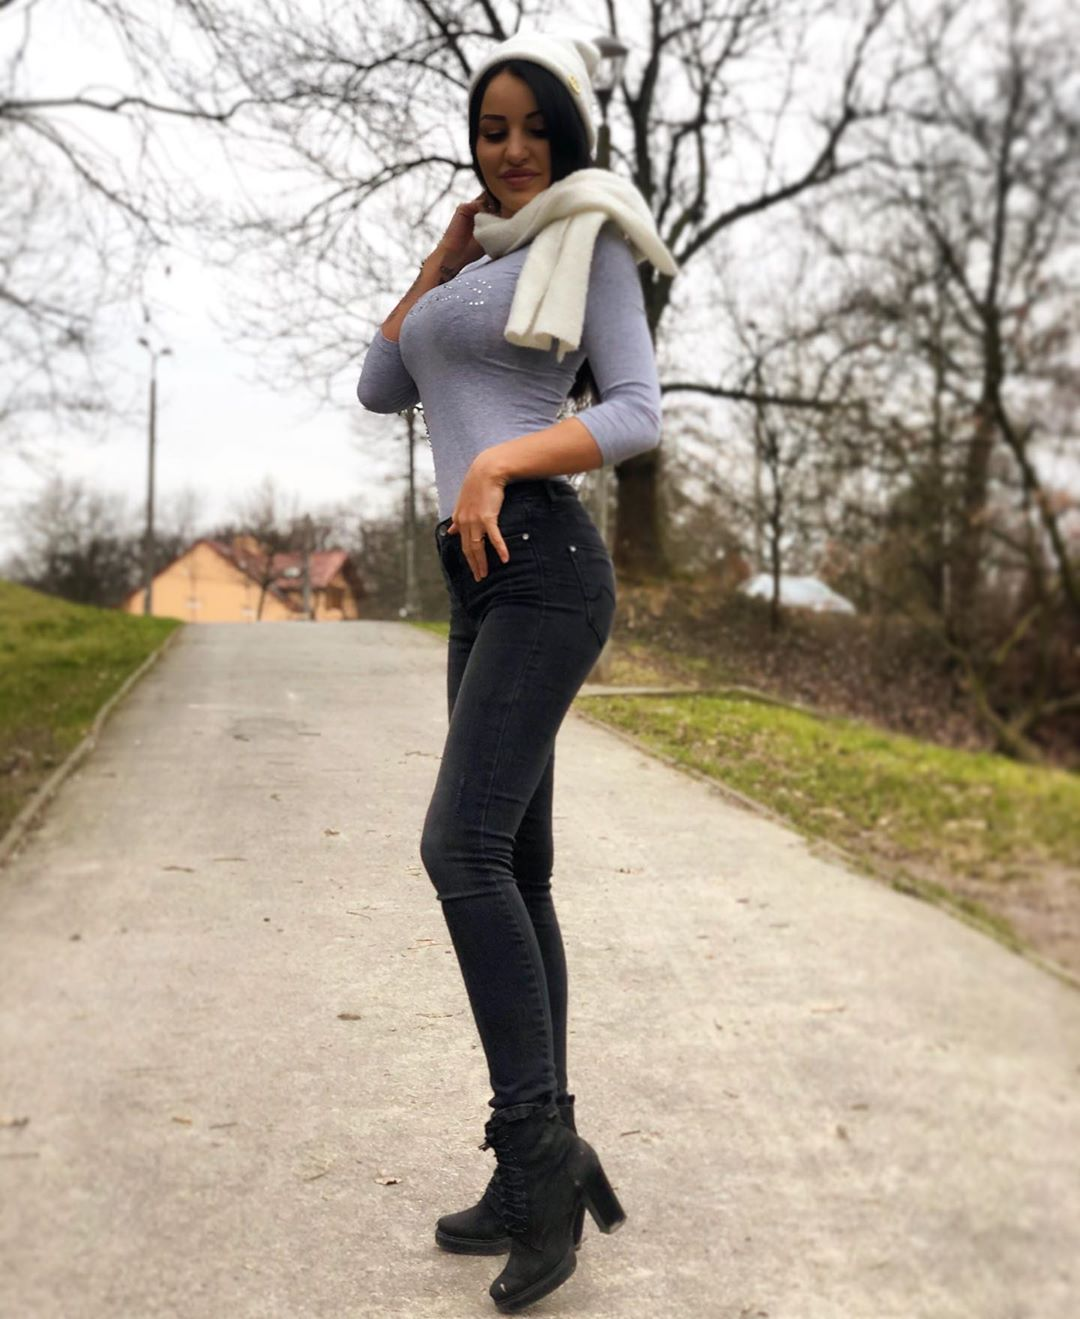 Natalia-Fitnesska-Wallpapers-Insta-Fit-Bio-5